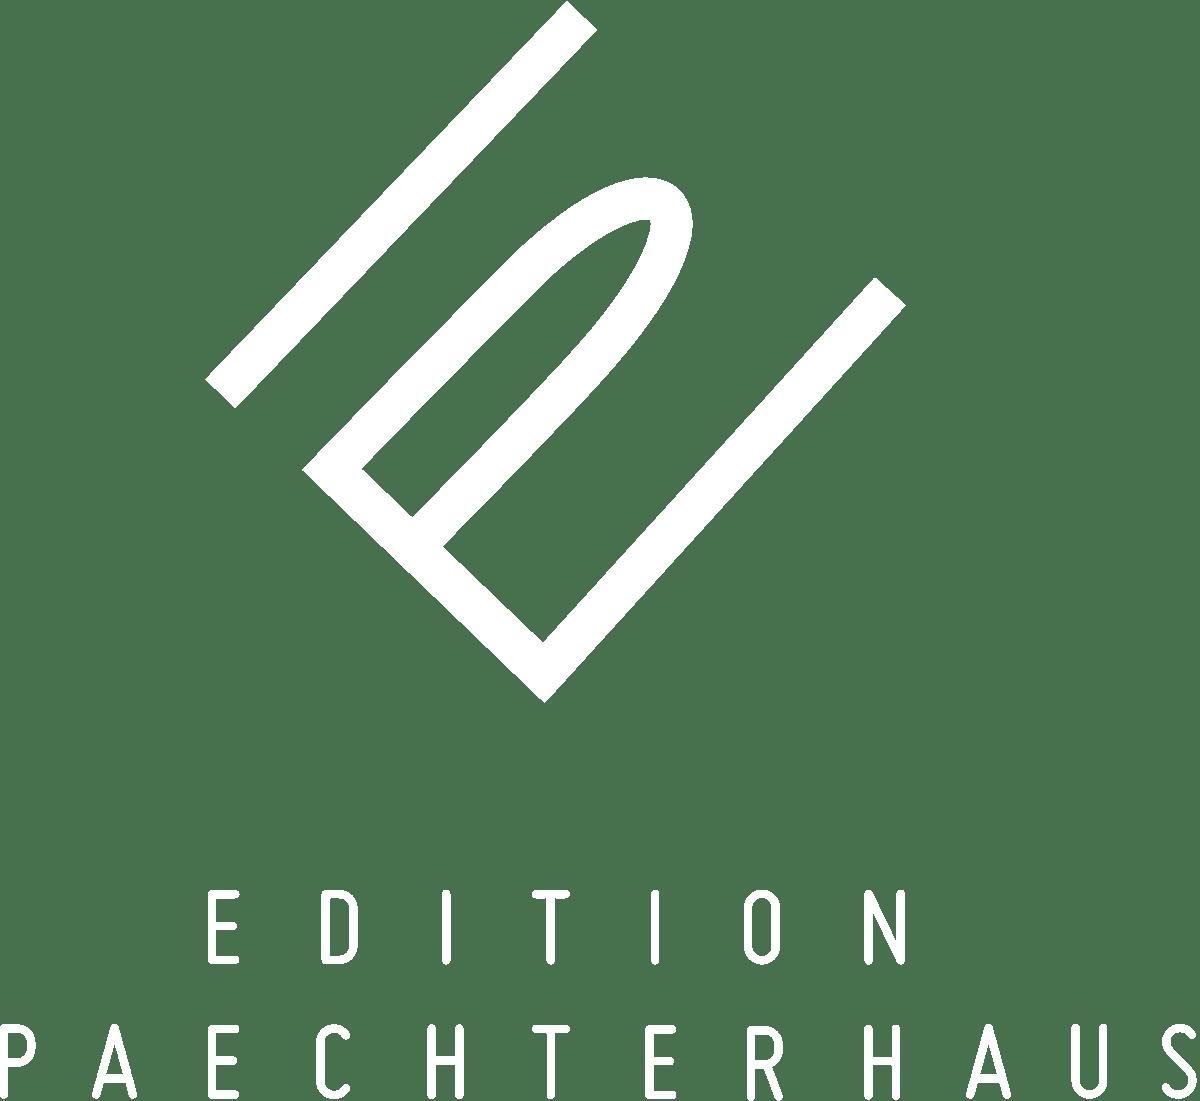 Edition Paechterhaus